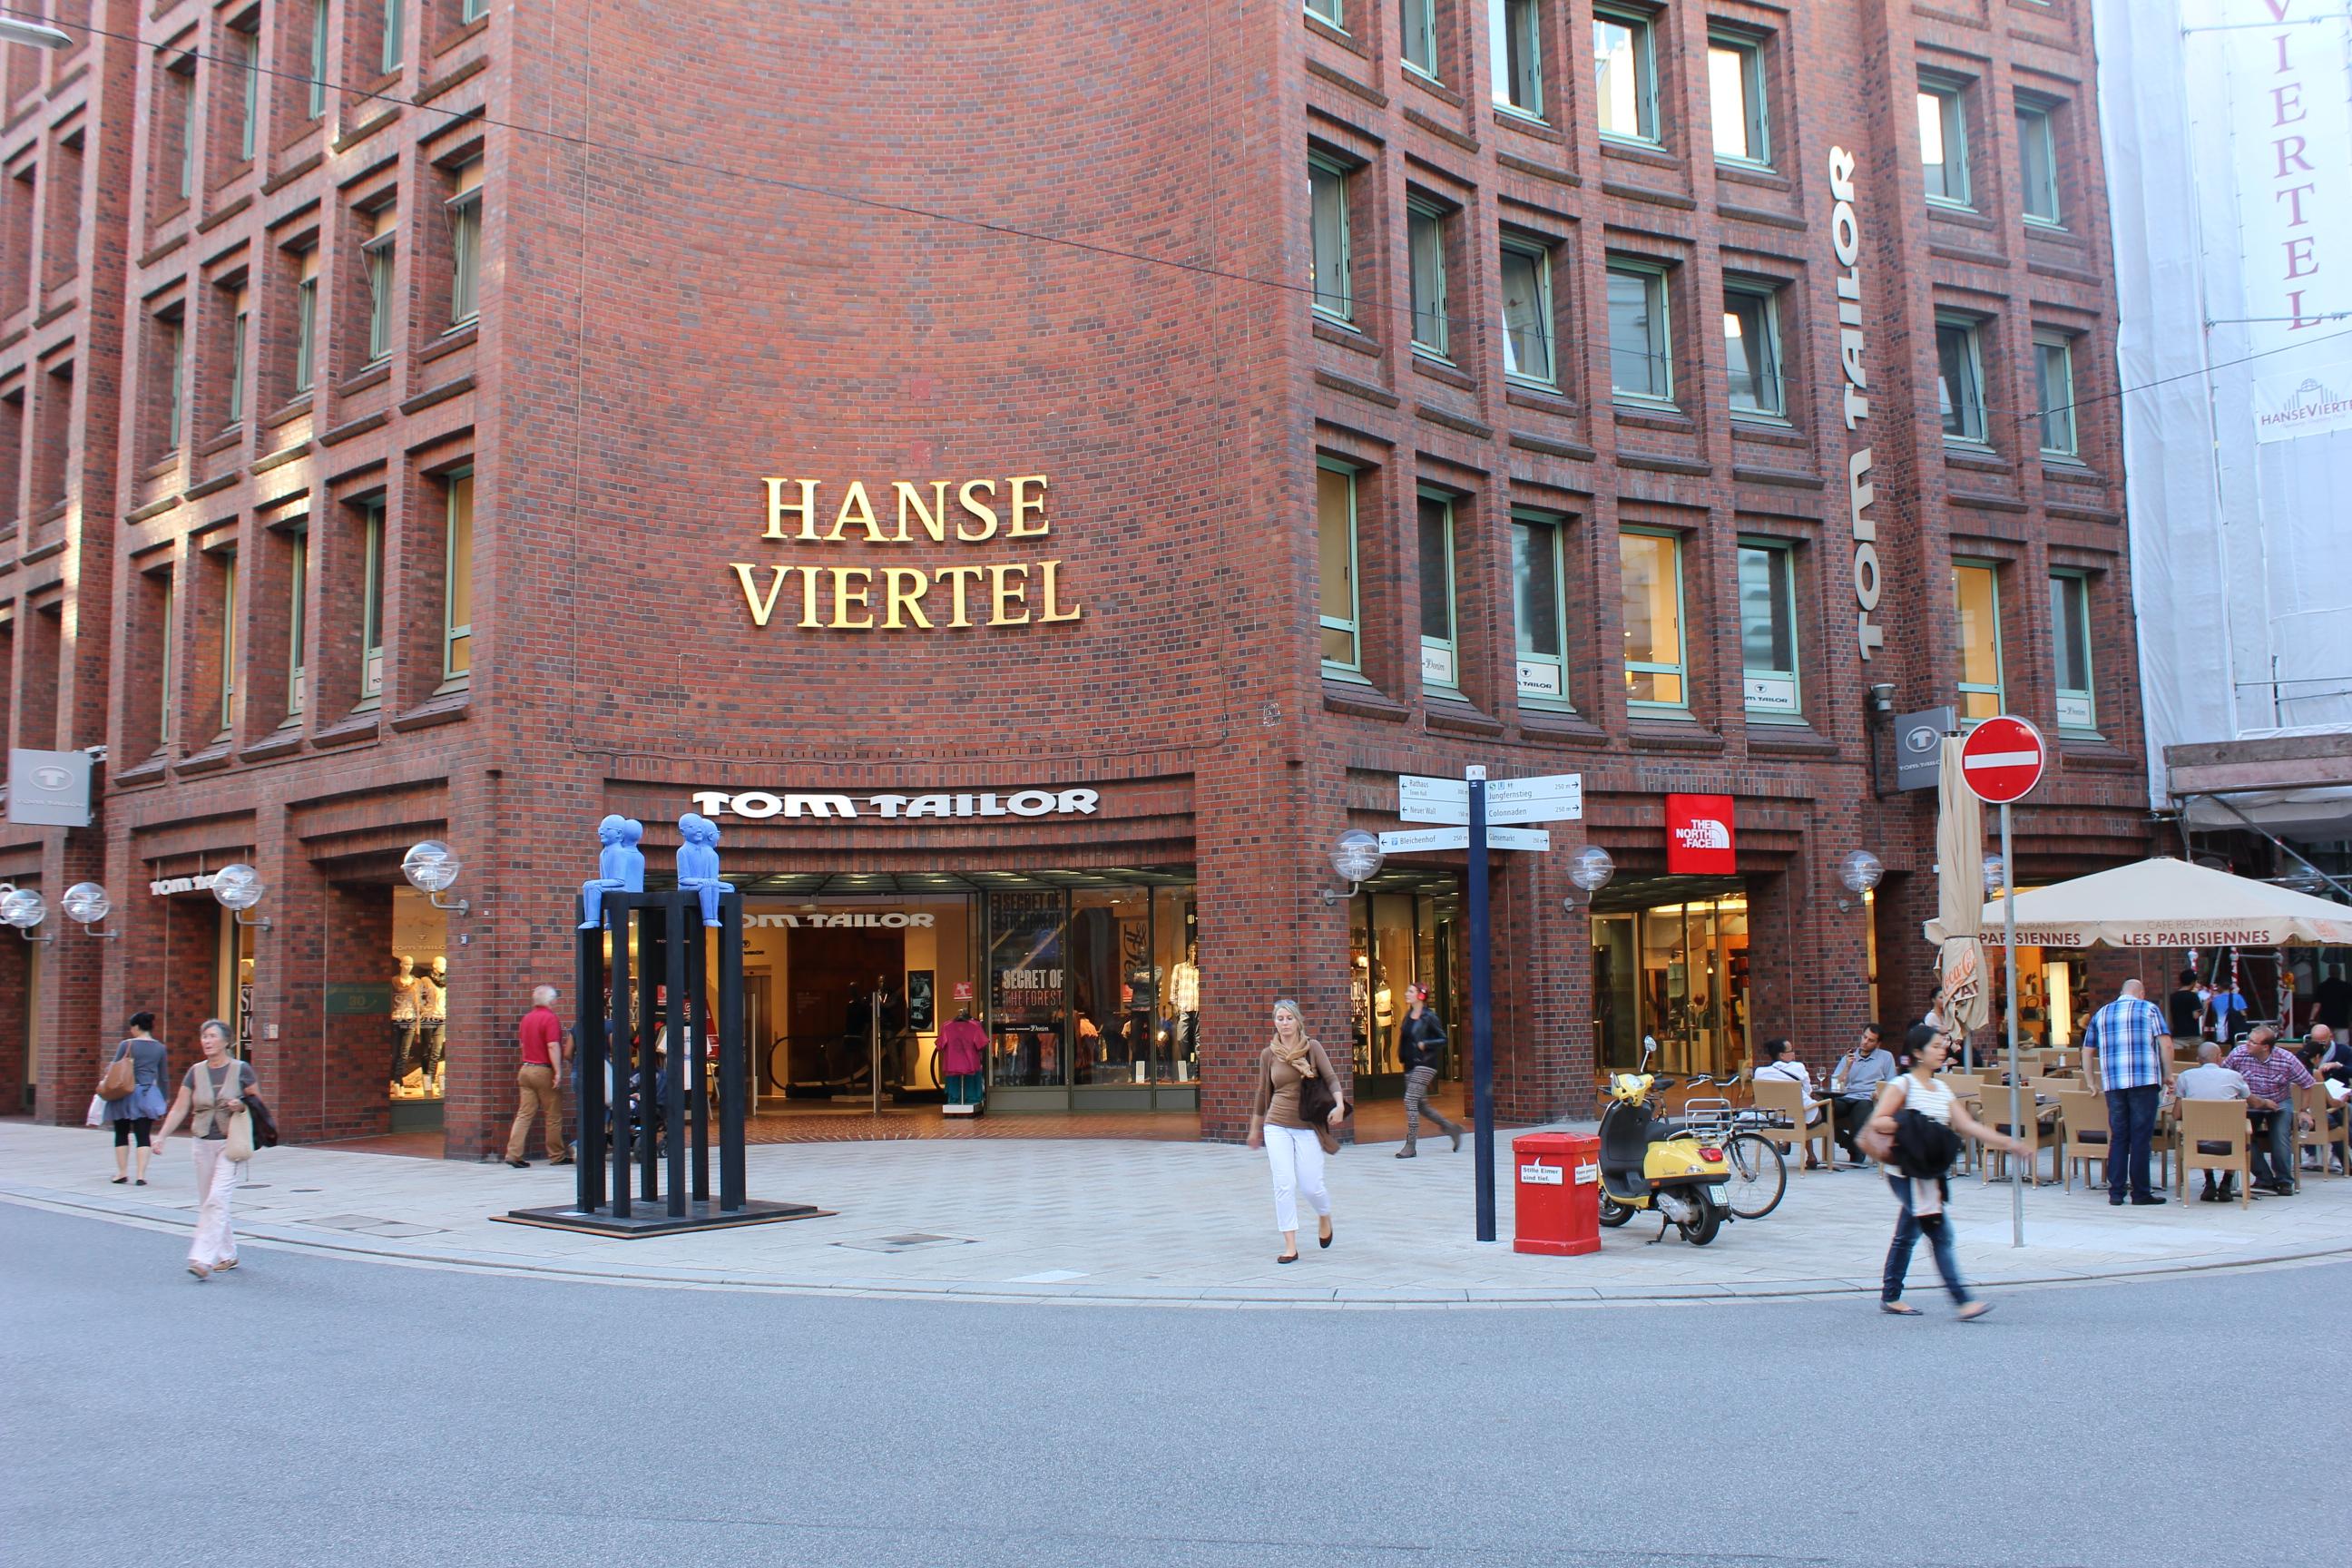 Hanse-Viertel Foto: Hanseviertel